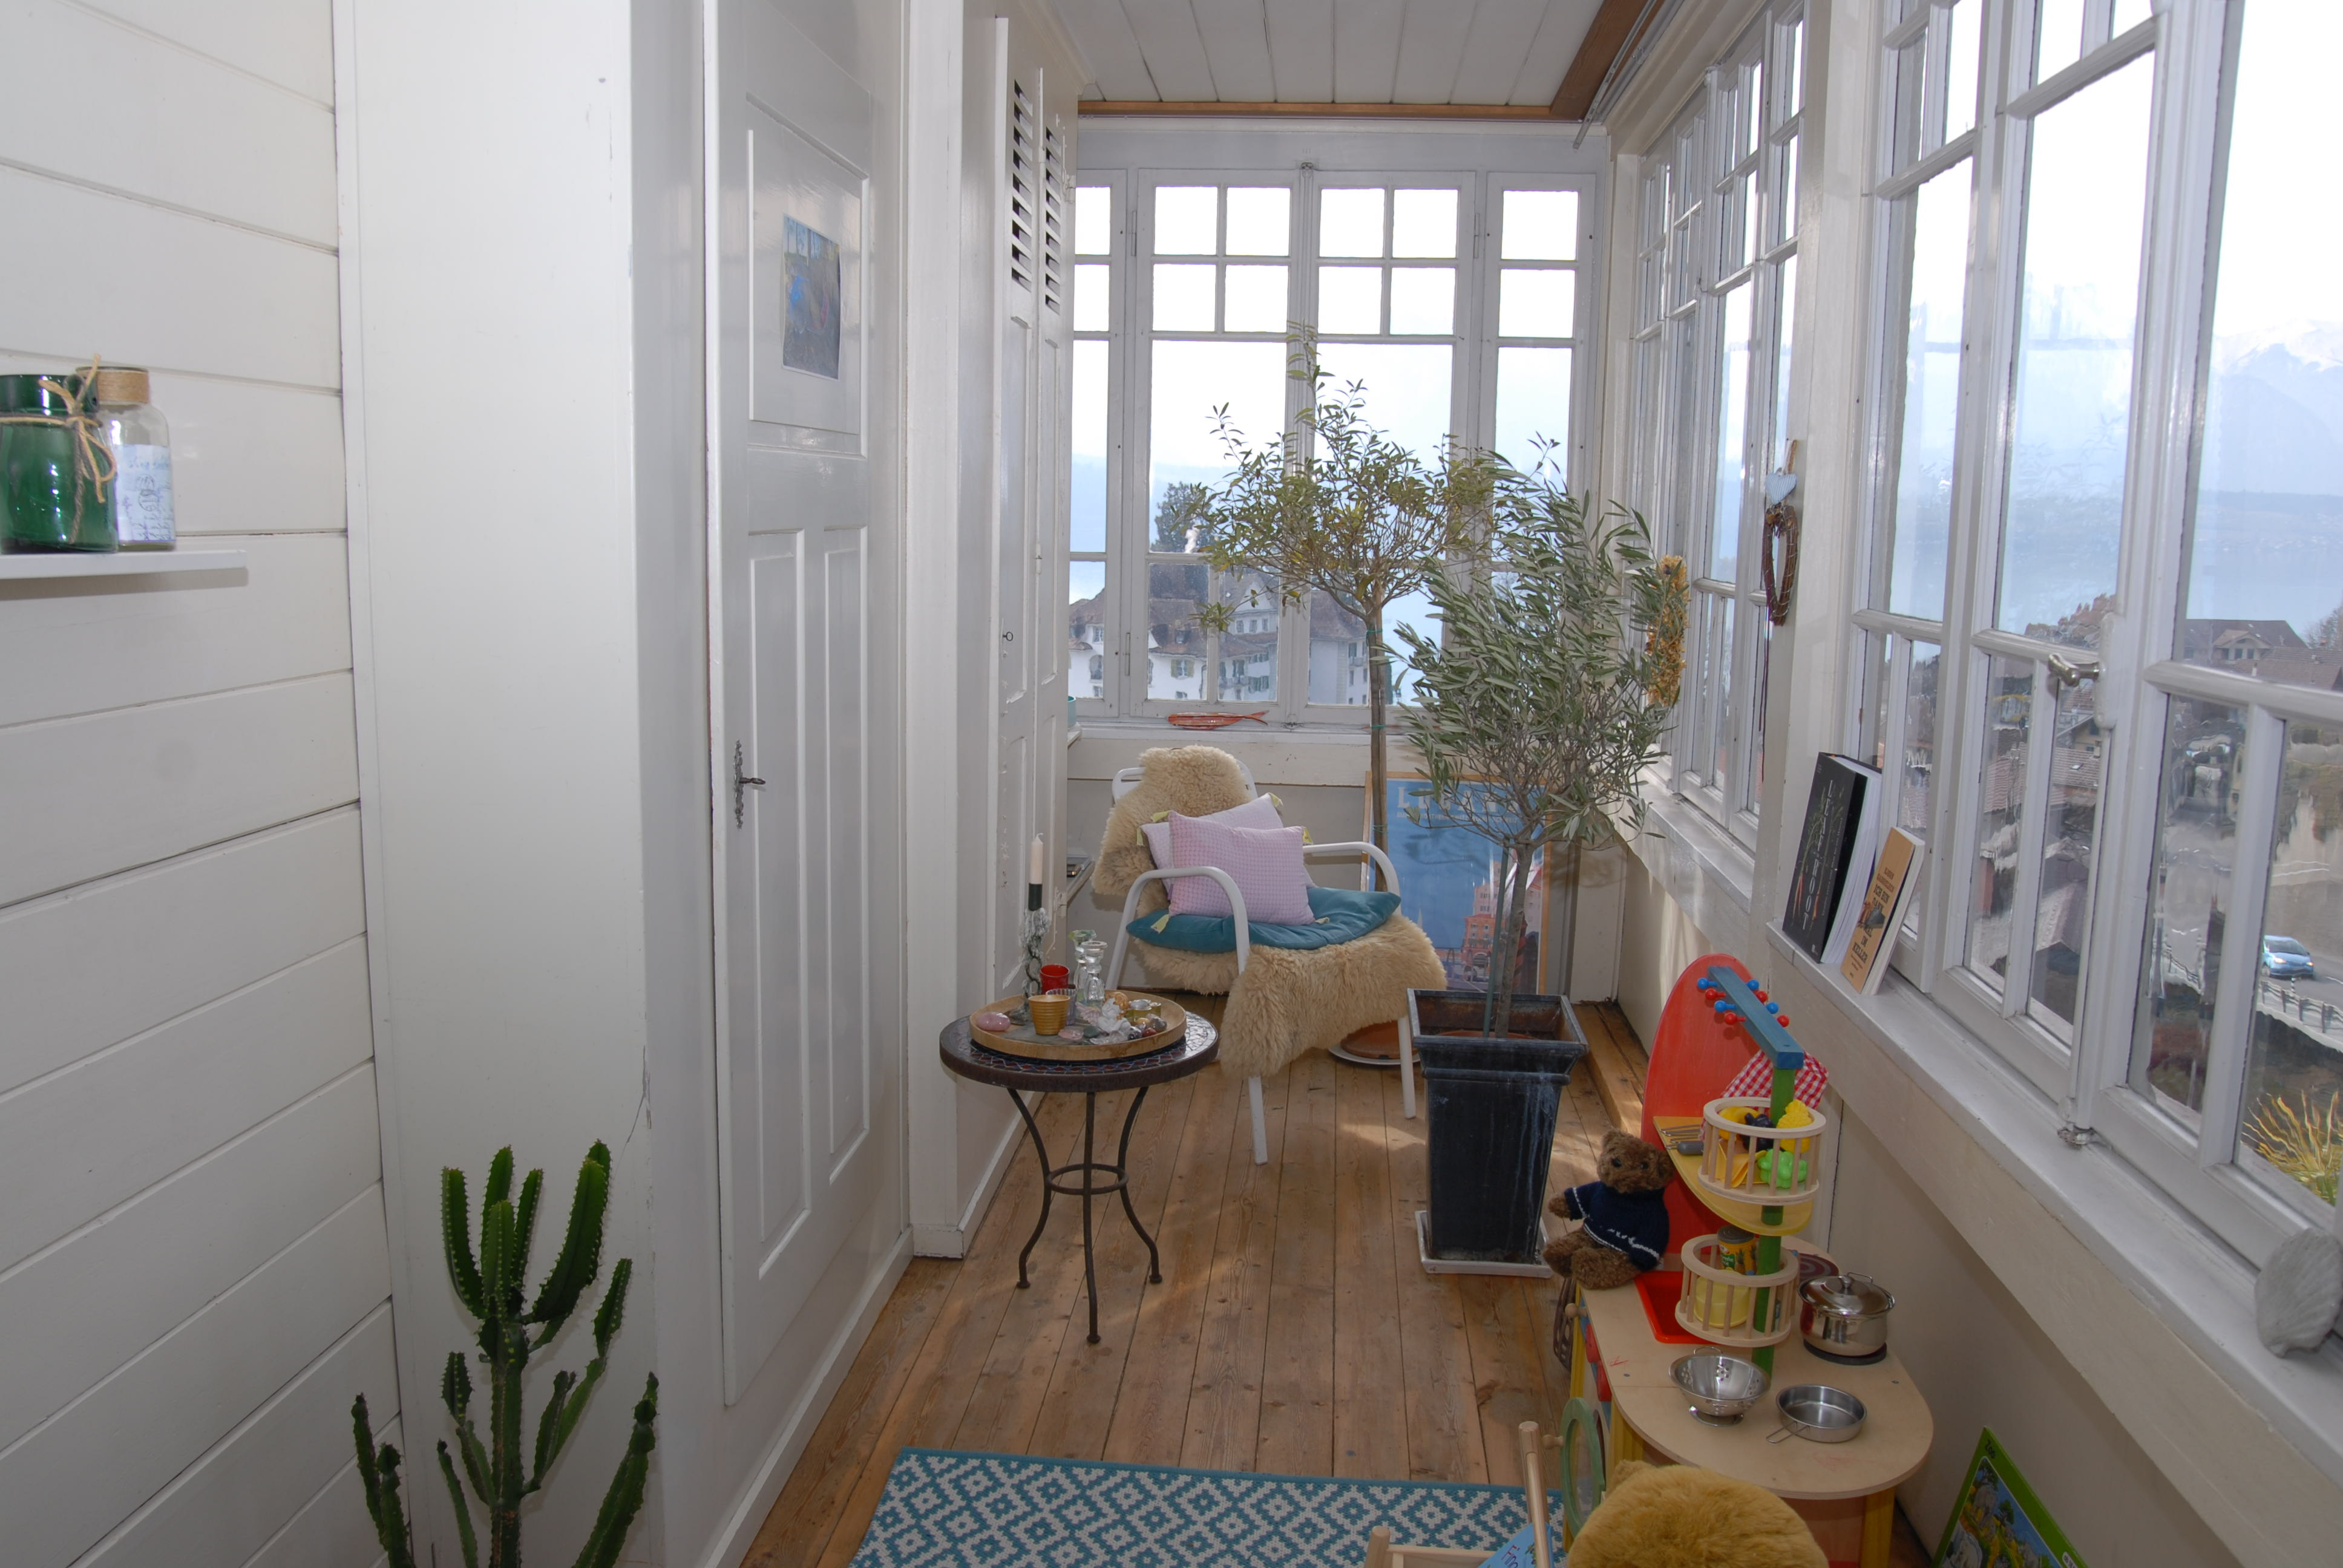 6 Zimmer Einfamilienhaus - Henggi Immobilien - immohenggi.ch